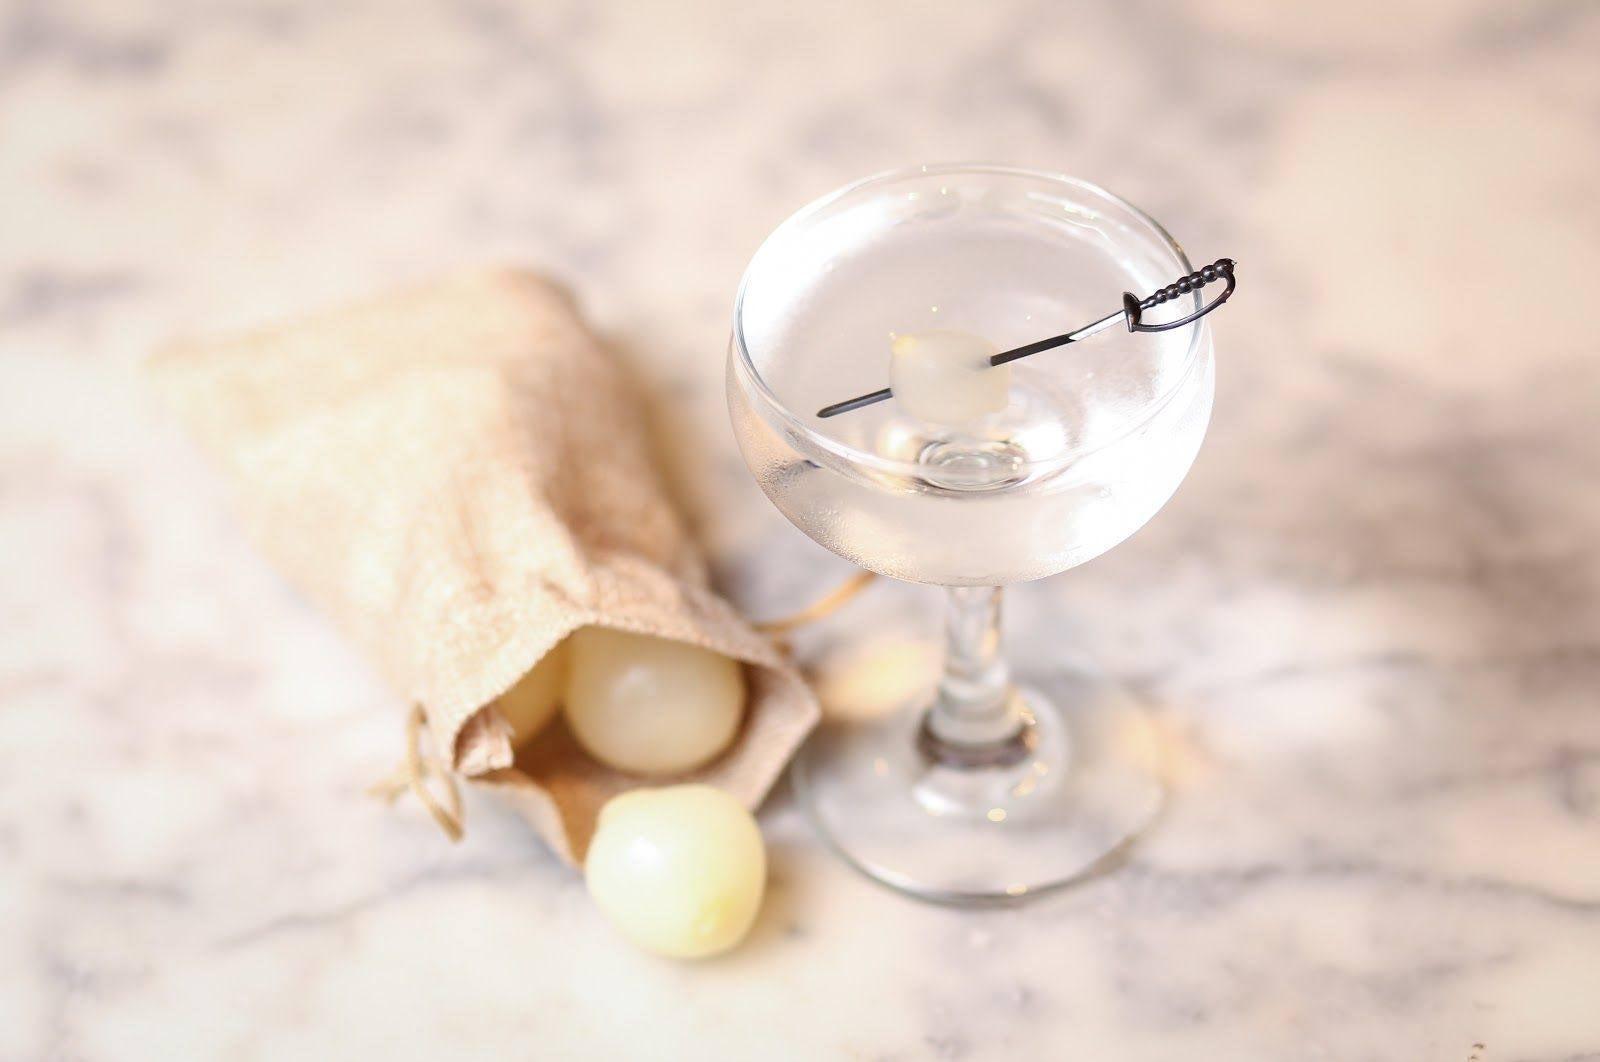 Onion Knight cocktail at Big Bar